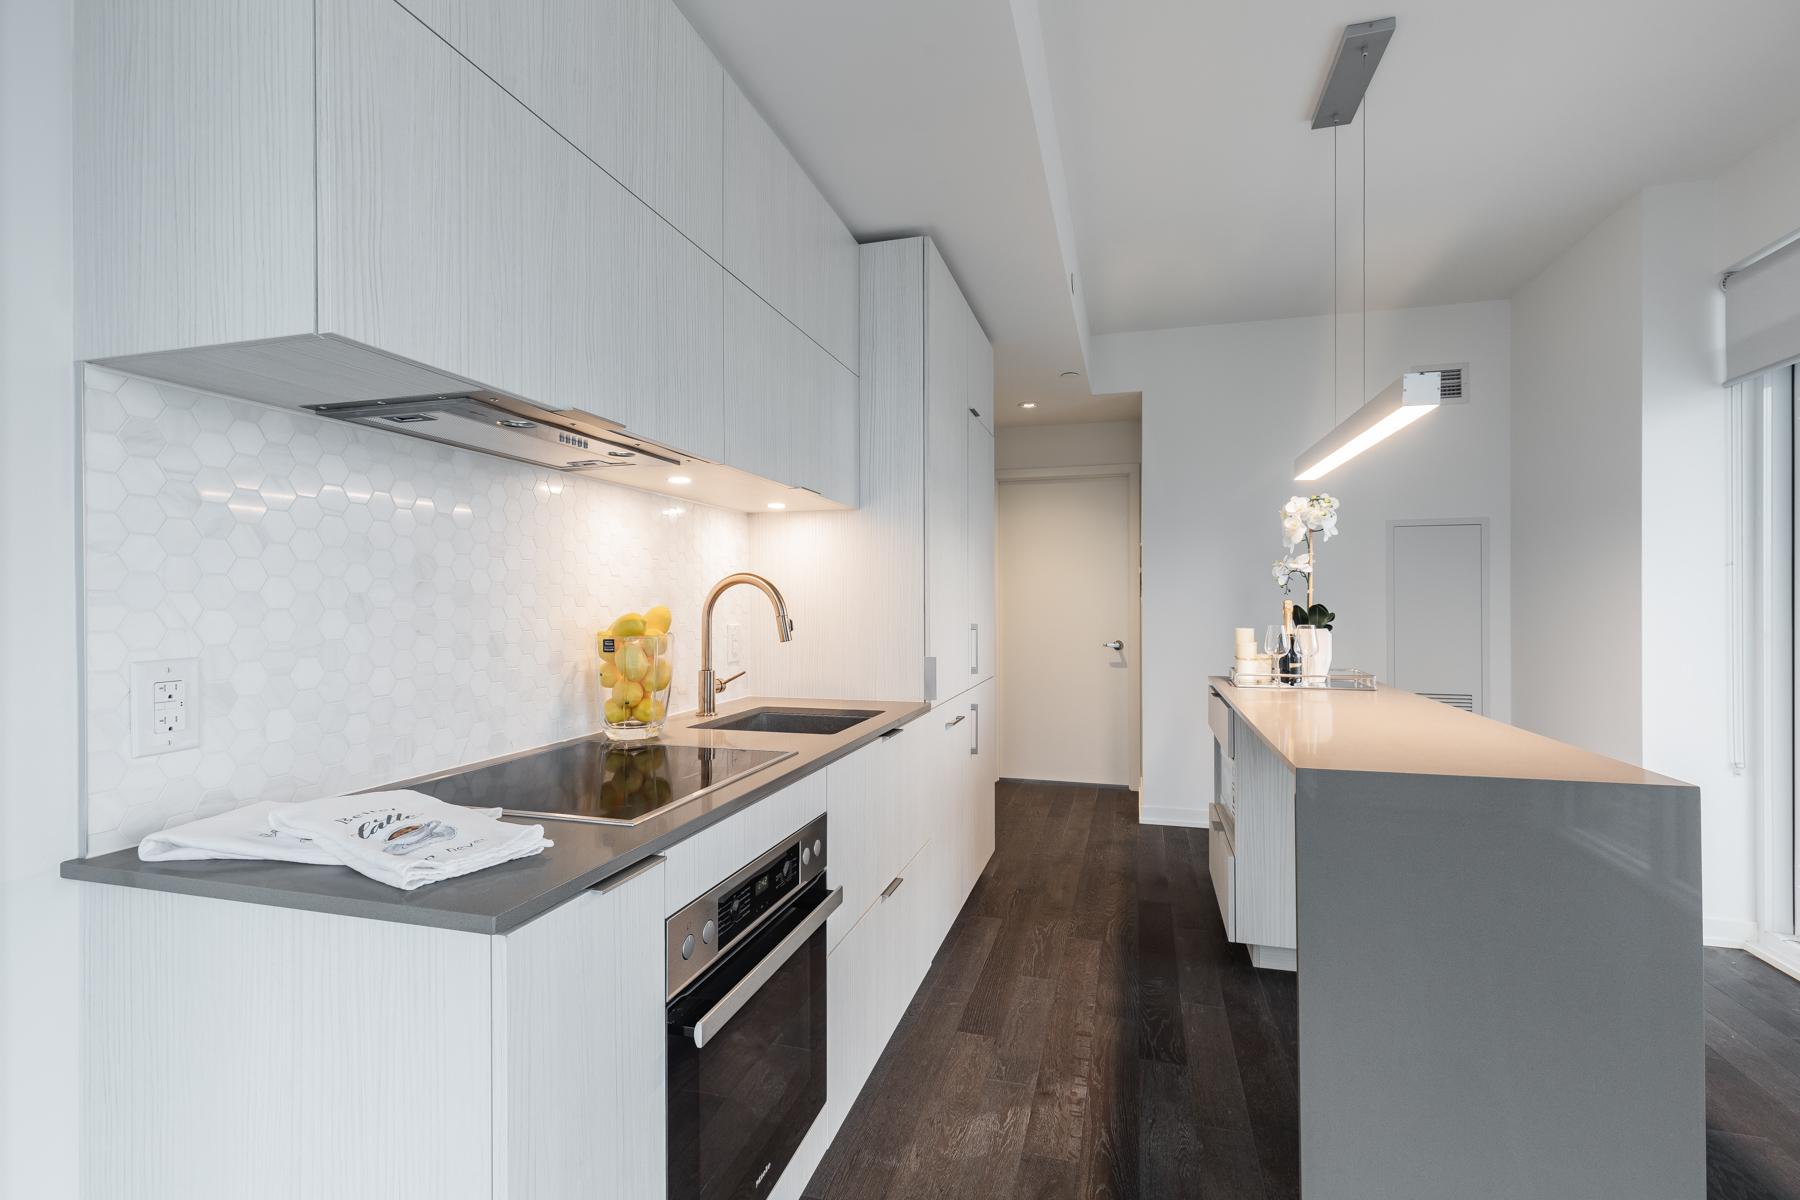 Close up of kitchen back-splash with shiny hexagon-shaped tiles.